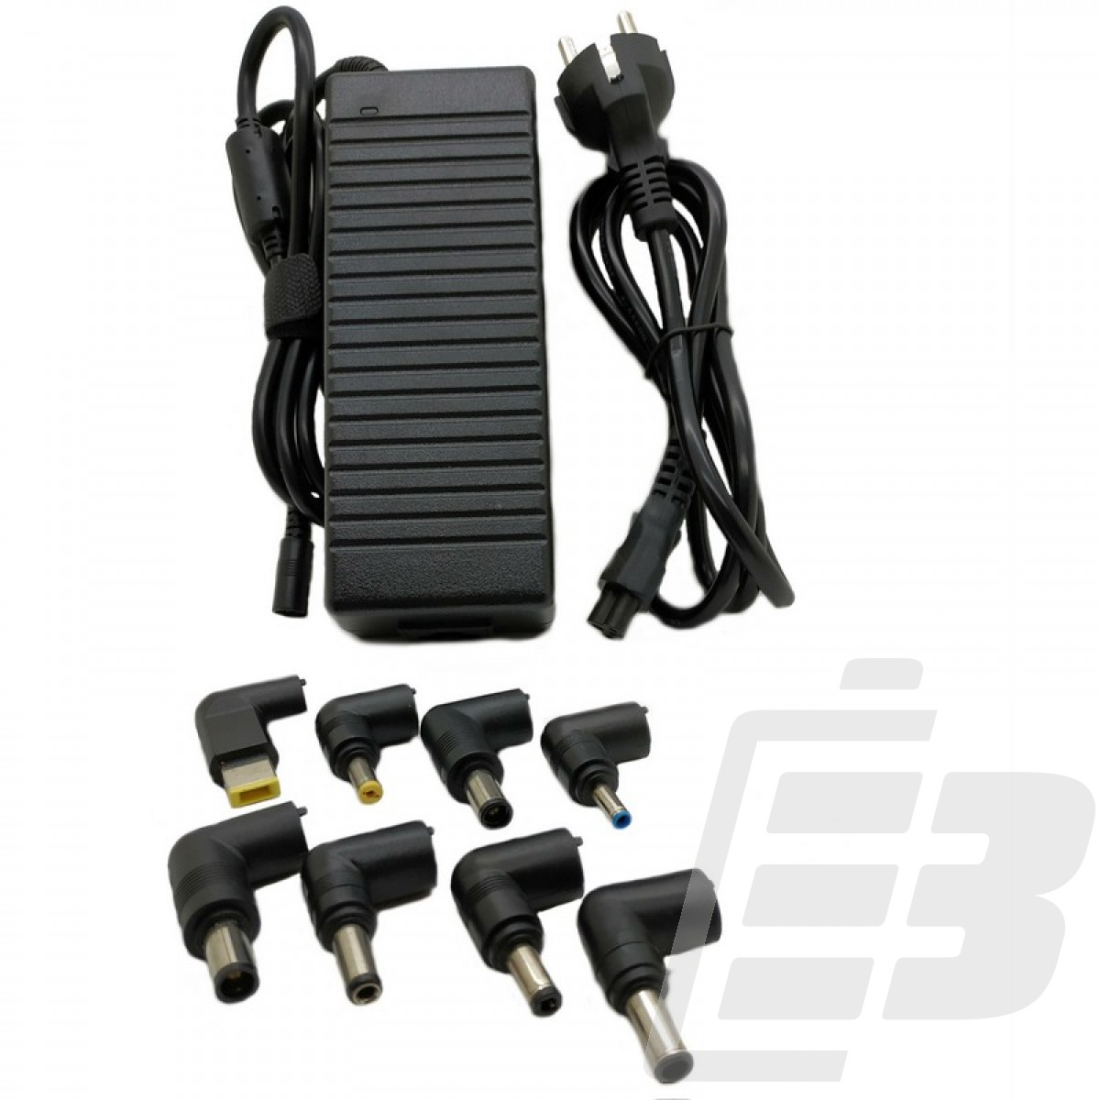 Laptop Universal Adapter 15-24V 120W_1